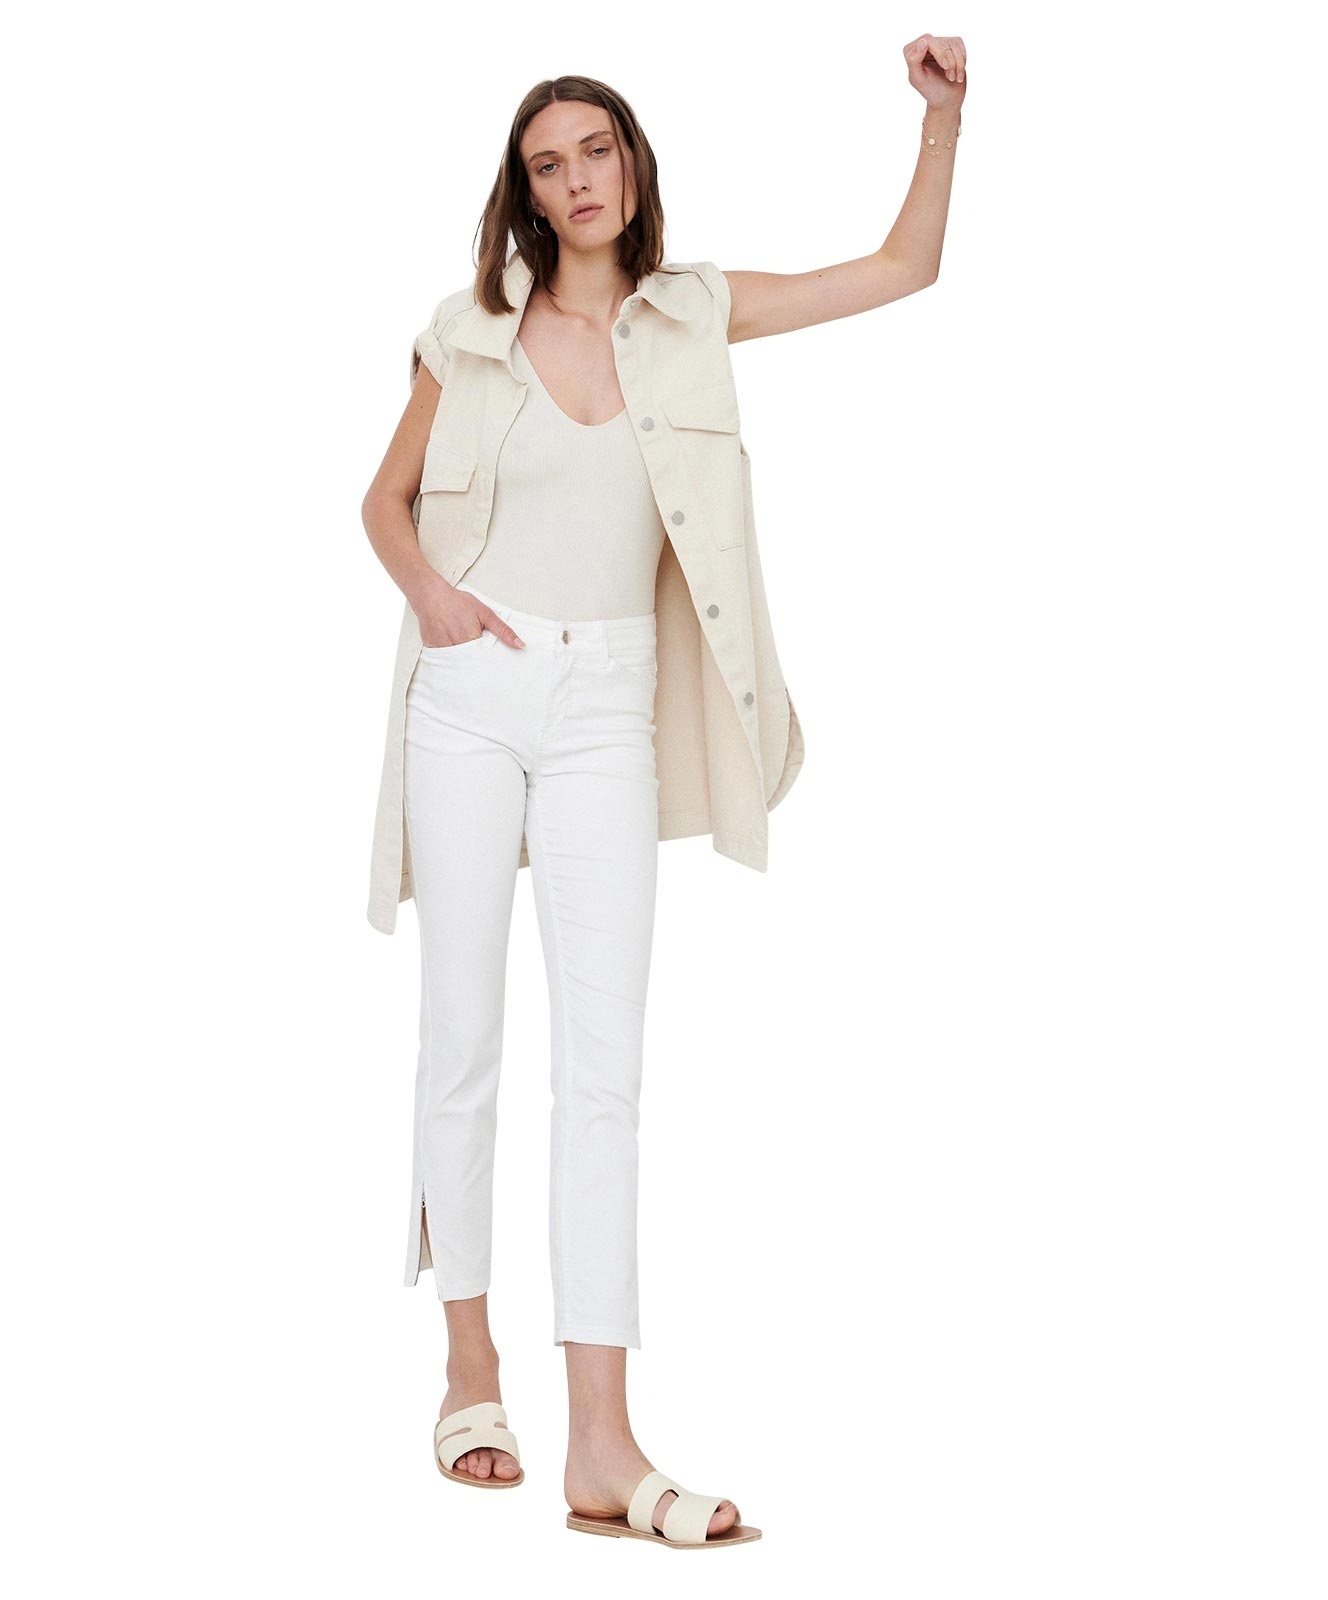 Hosen - MAC Ankle Jeans Dream Chic in White Denim  - Onlineshop Jeans Meile